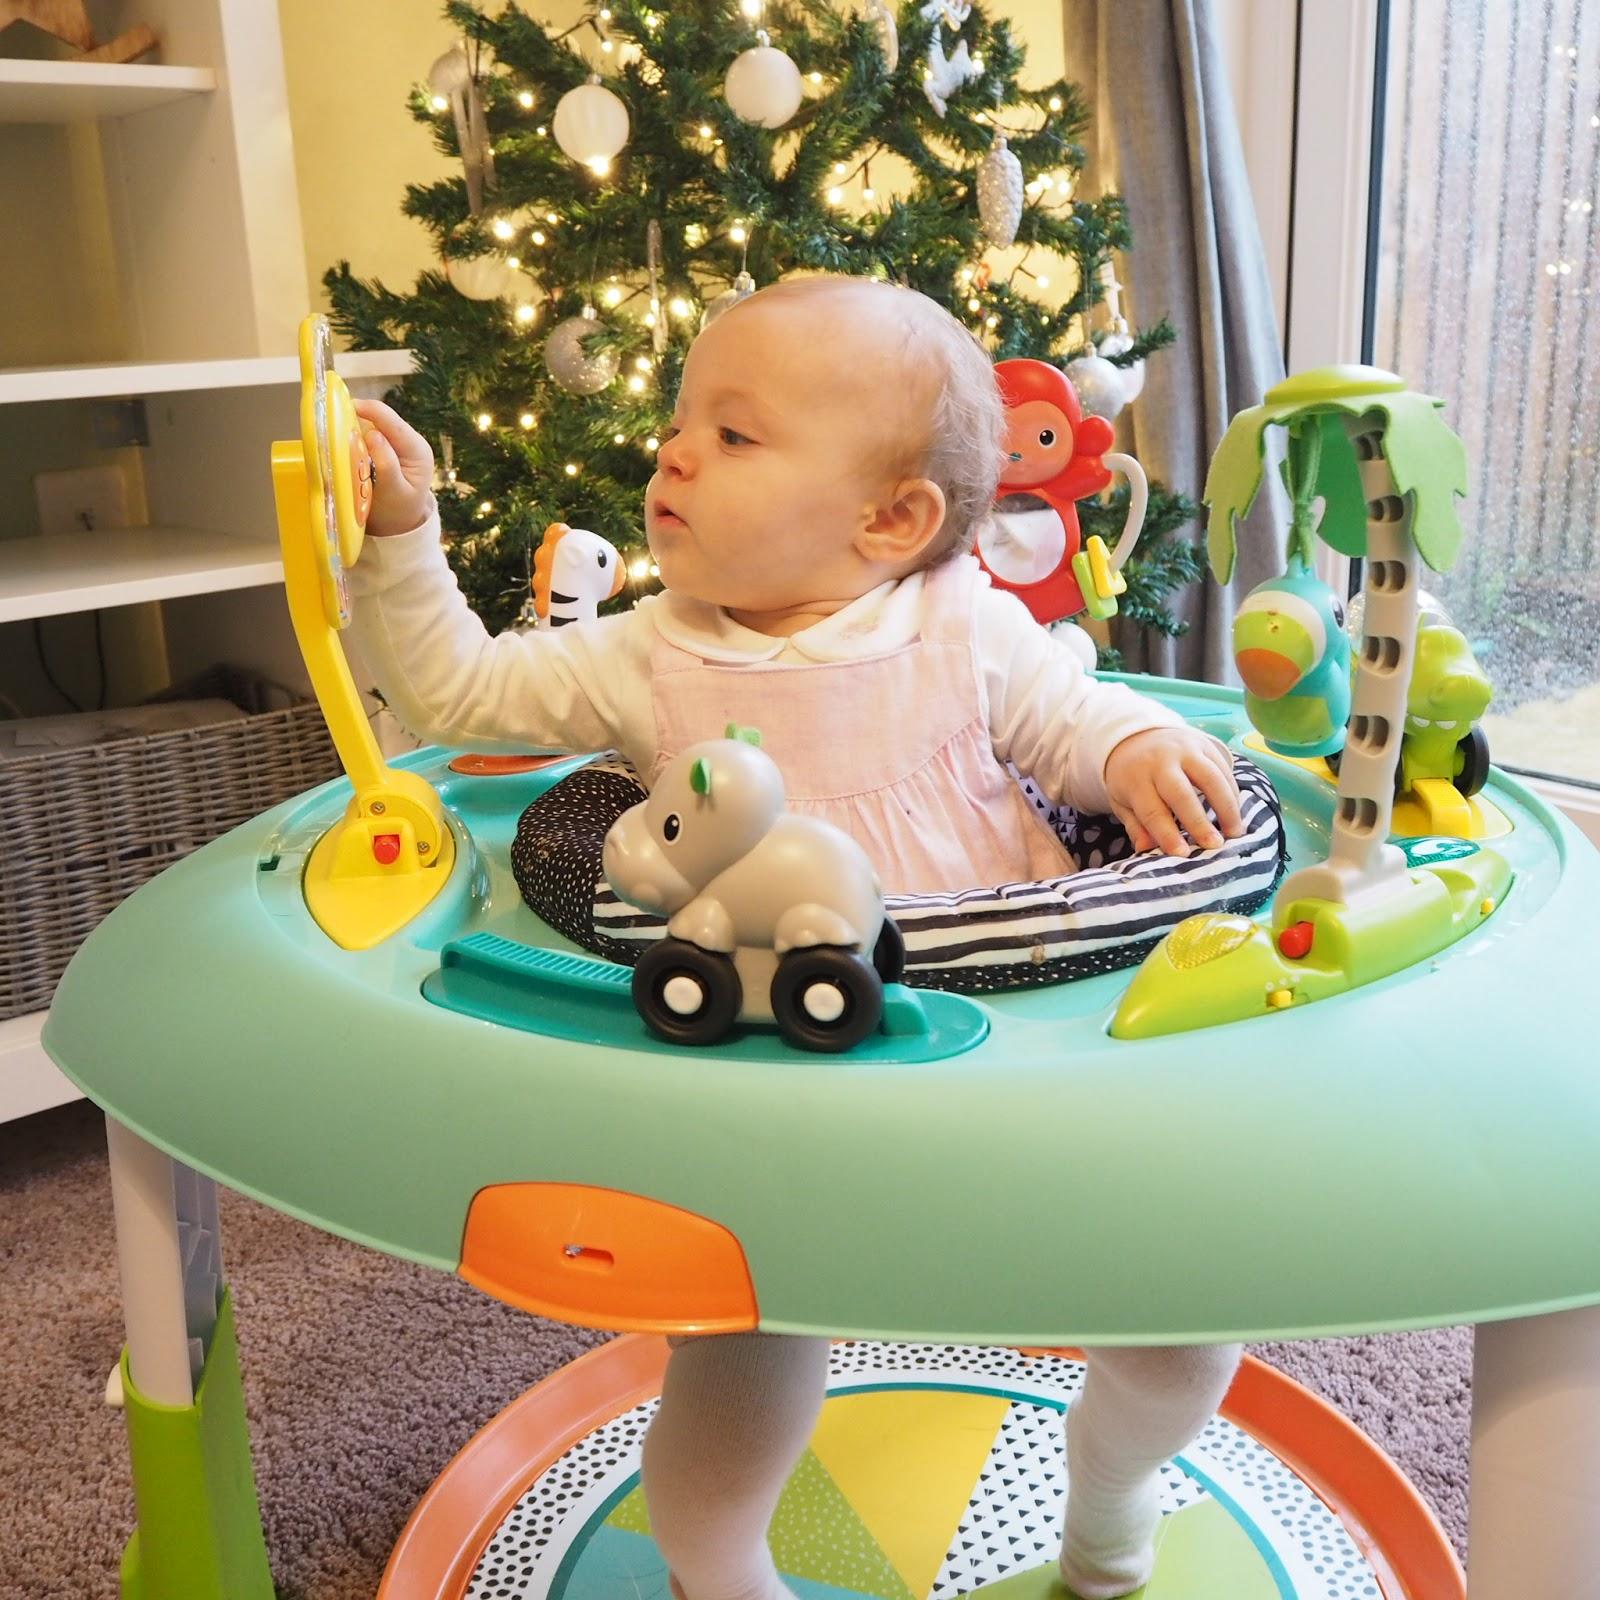 e3e152189 The Entertainer Sit